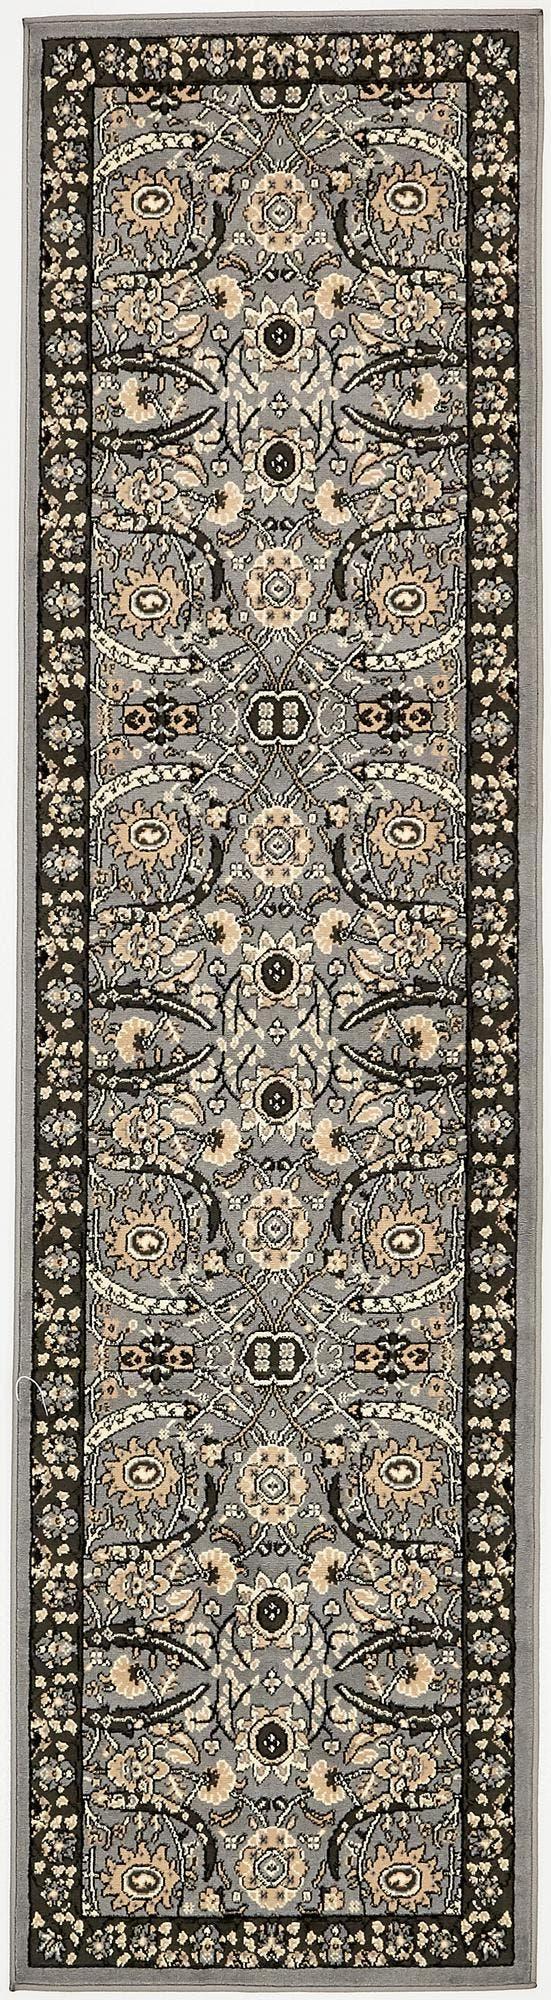 2' 7 x 10' Isfahan Design Runner Rug main image